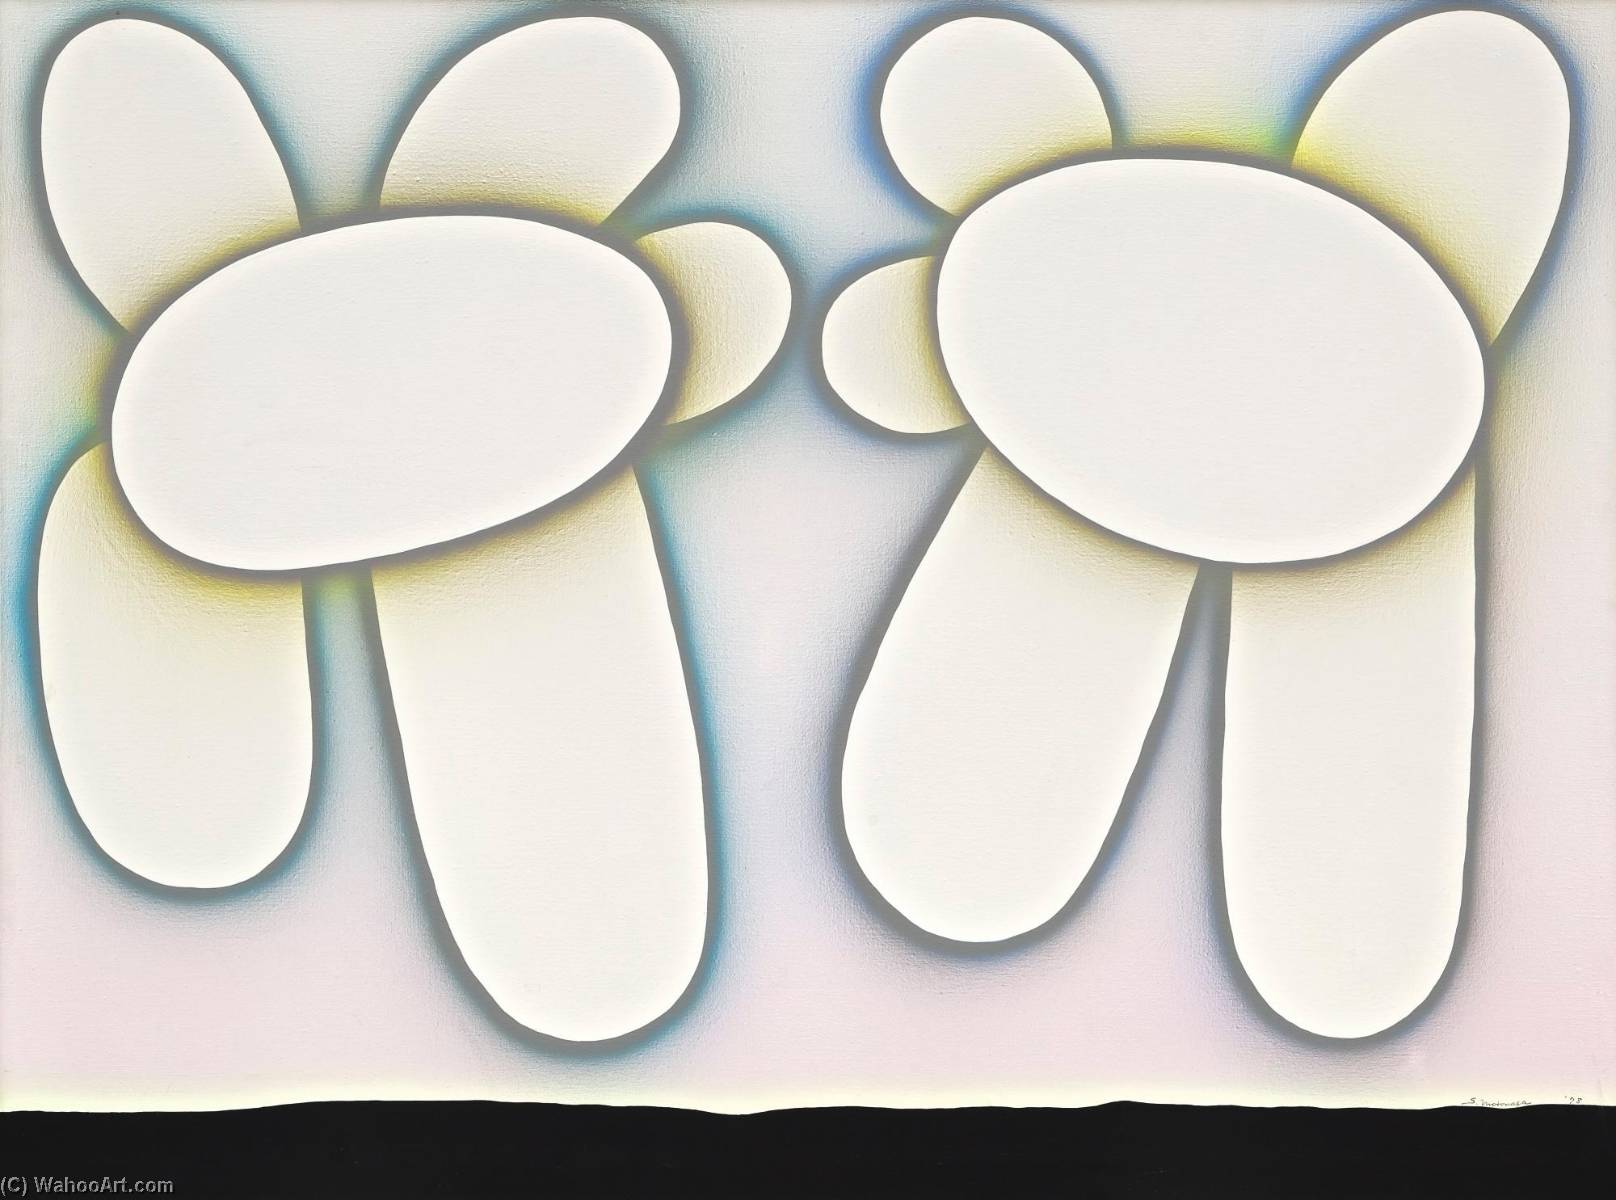 Wikioo.org - The Encyclopedia of Fine Arts - Painting, Artwork by Sadamasa Motonaga - Untitled (Howa Howa)